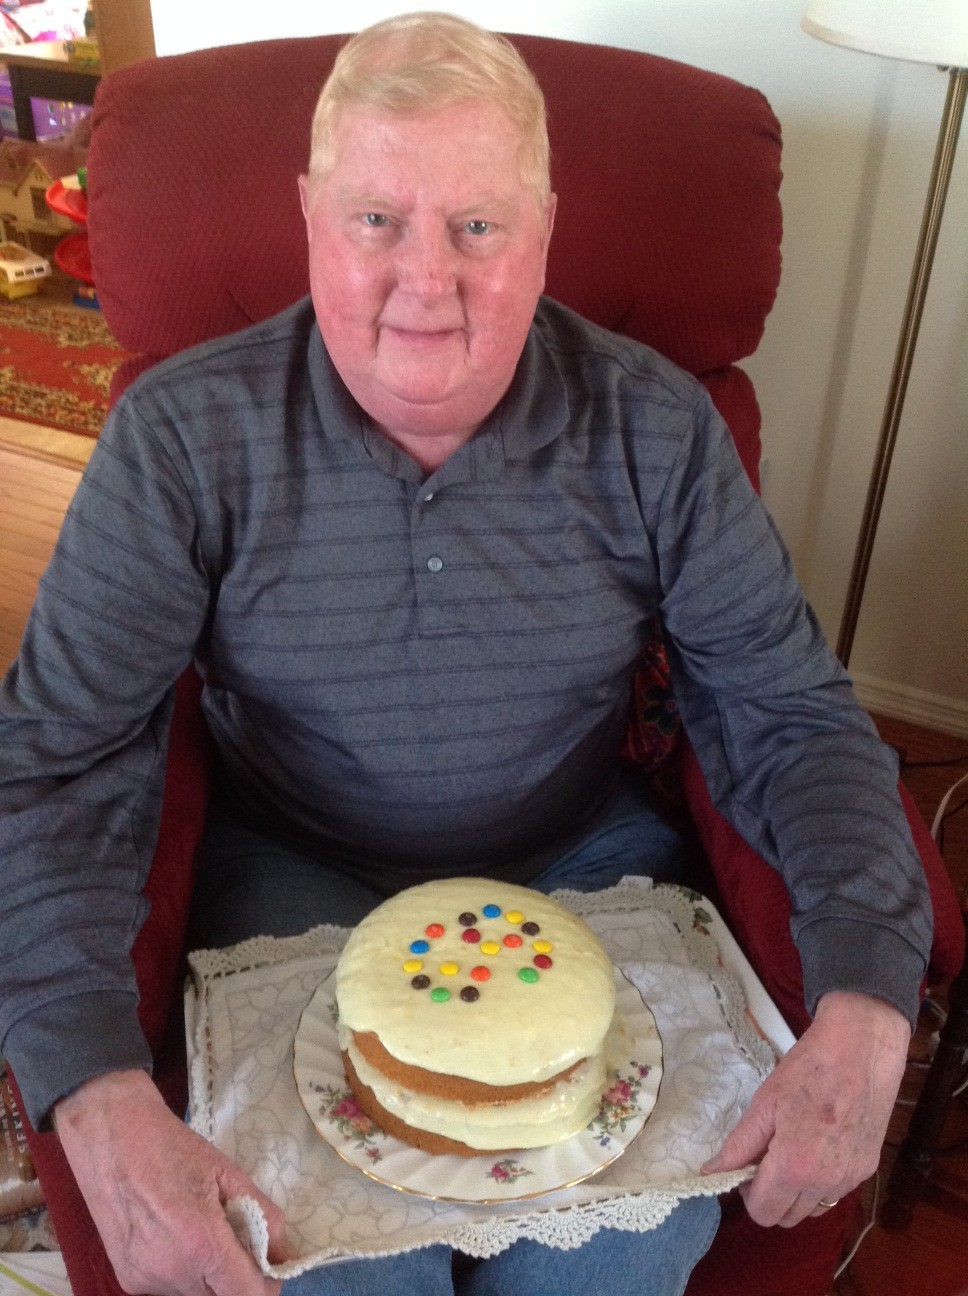 Noel on his recent Birthday enjoying his cake...